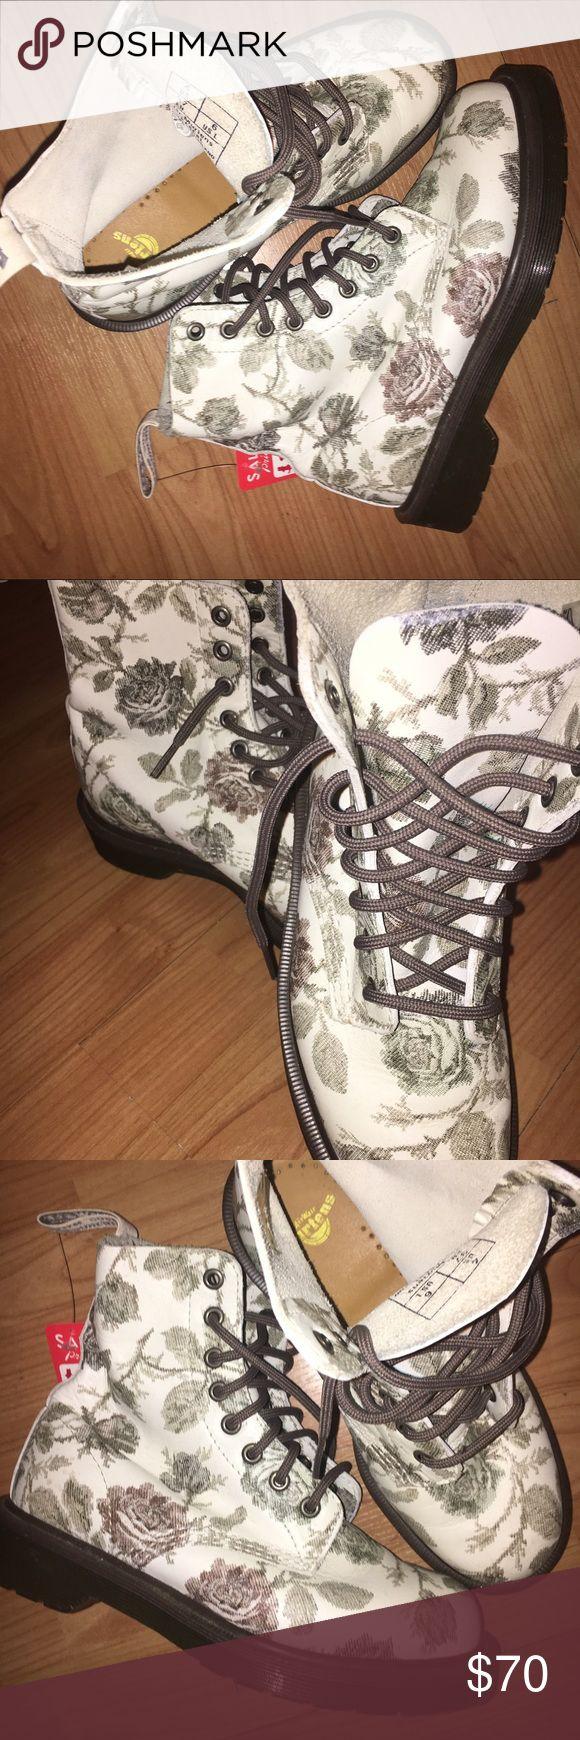 Floral doc marten boots Never worn floral printed docs! doc martens Shoes Combat & Moto Boots